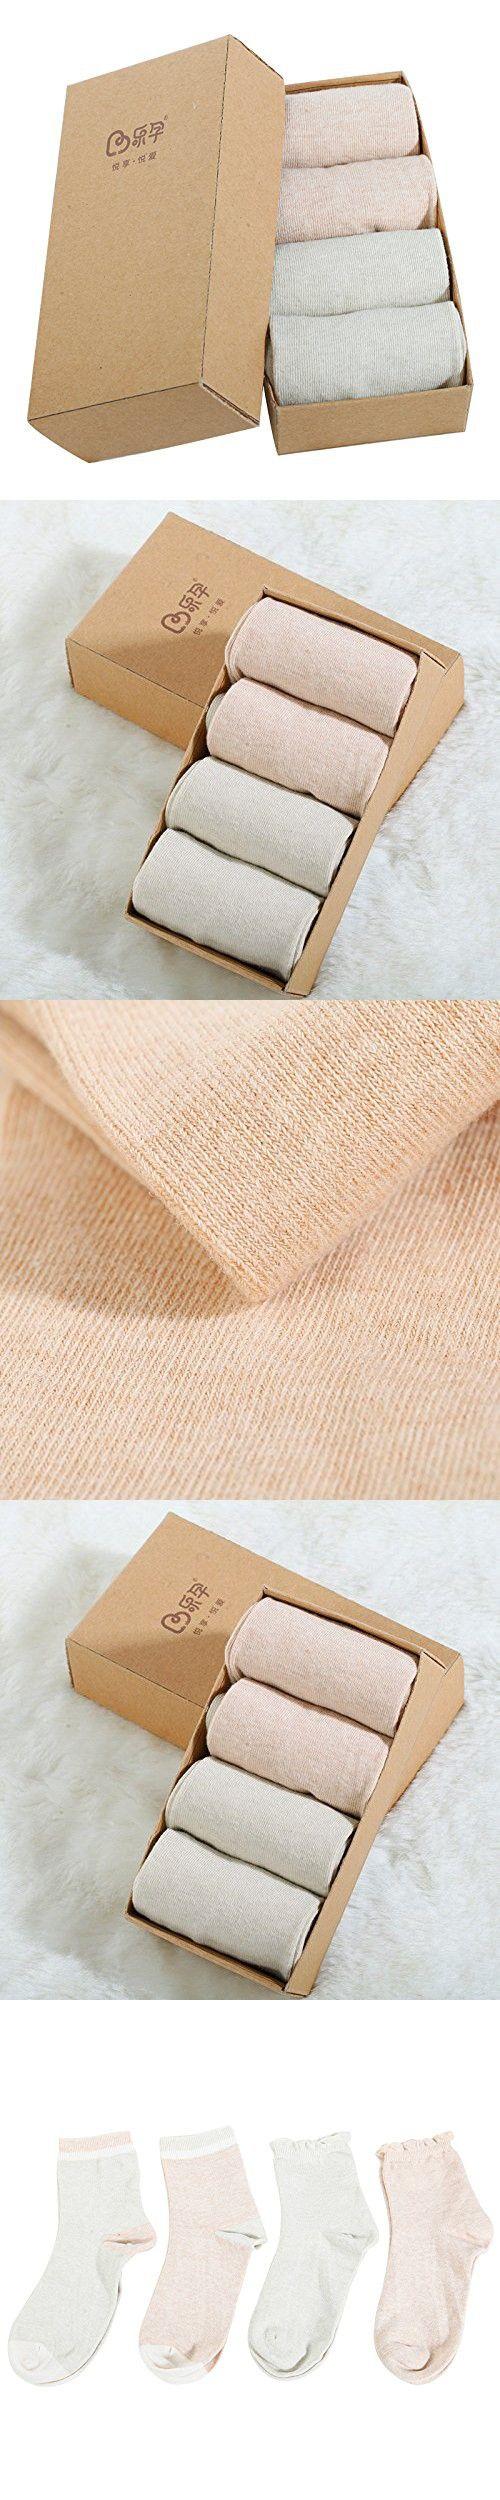 Leyun Maternity Cotton Socks 4 pairs Set